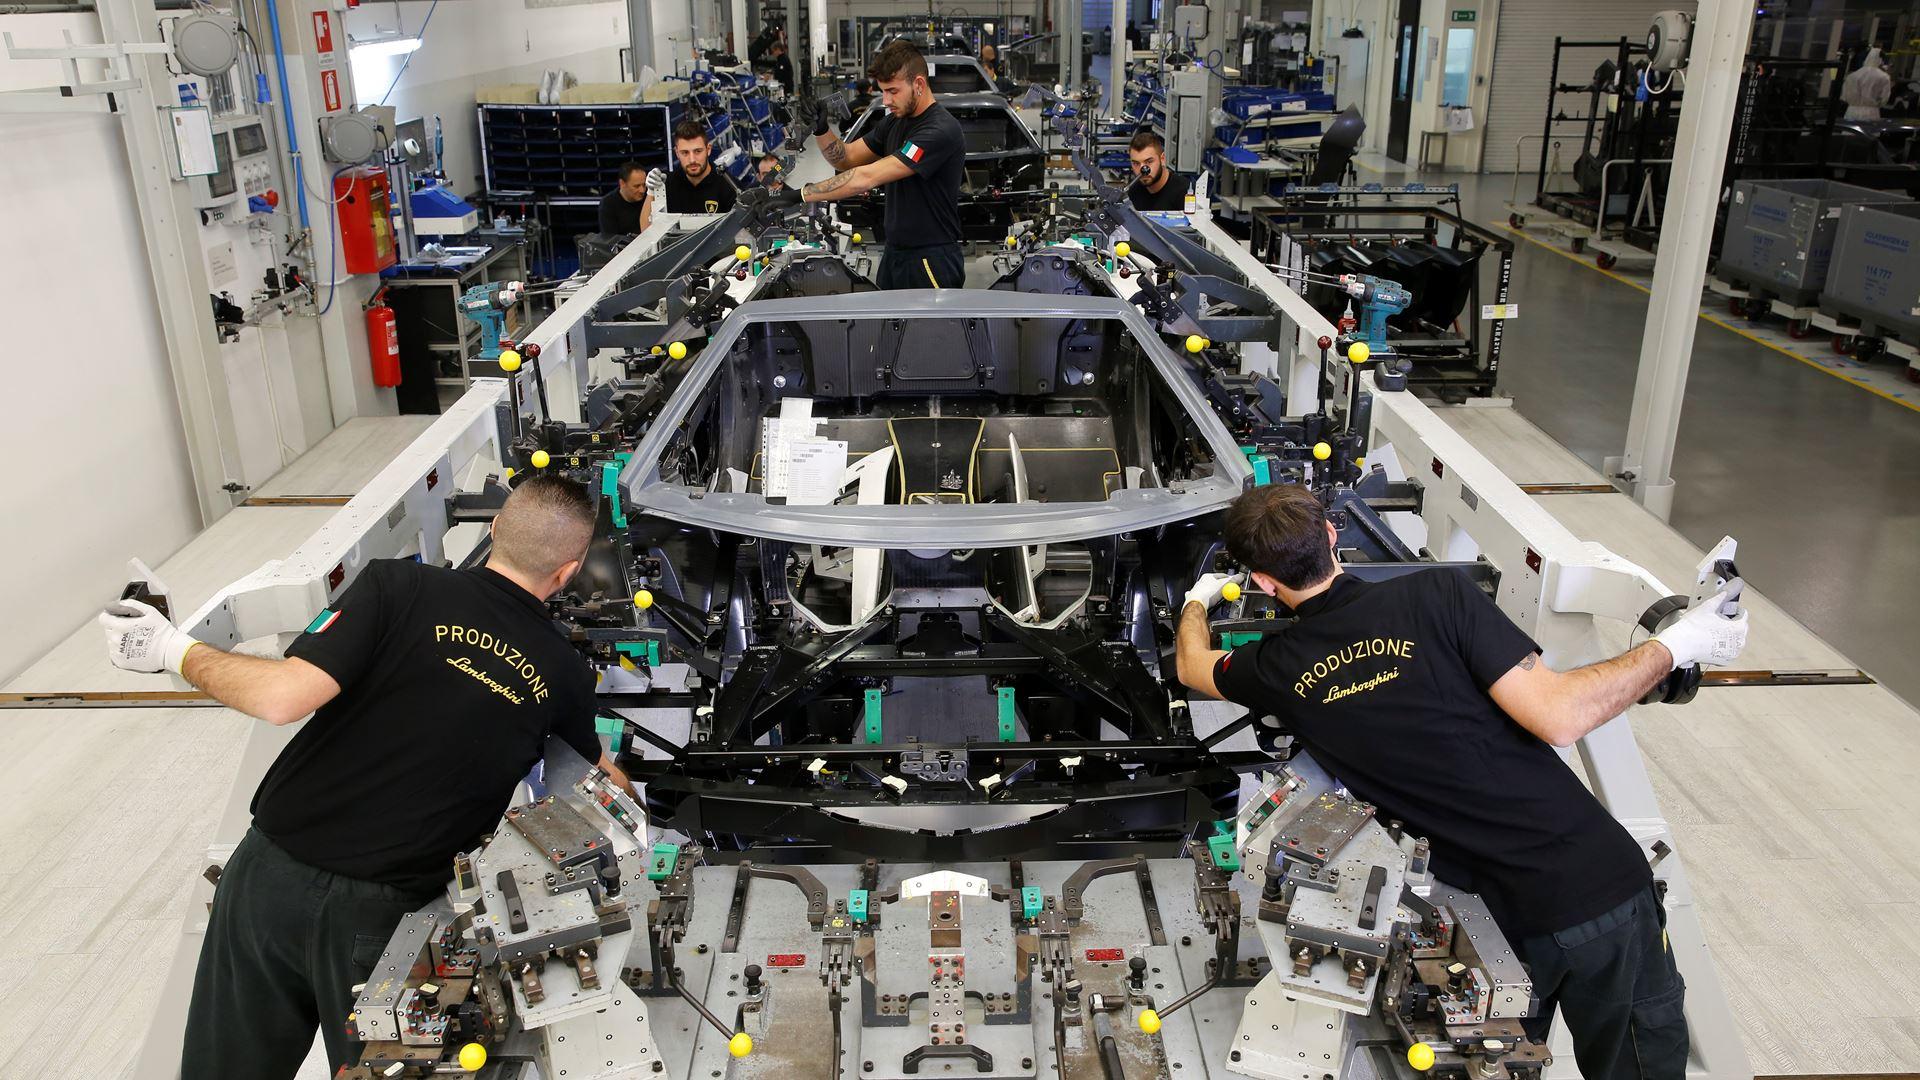 Lamborghini Aventador: 10 innovations in 10 years - Image 4